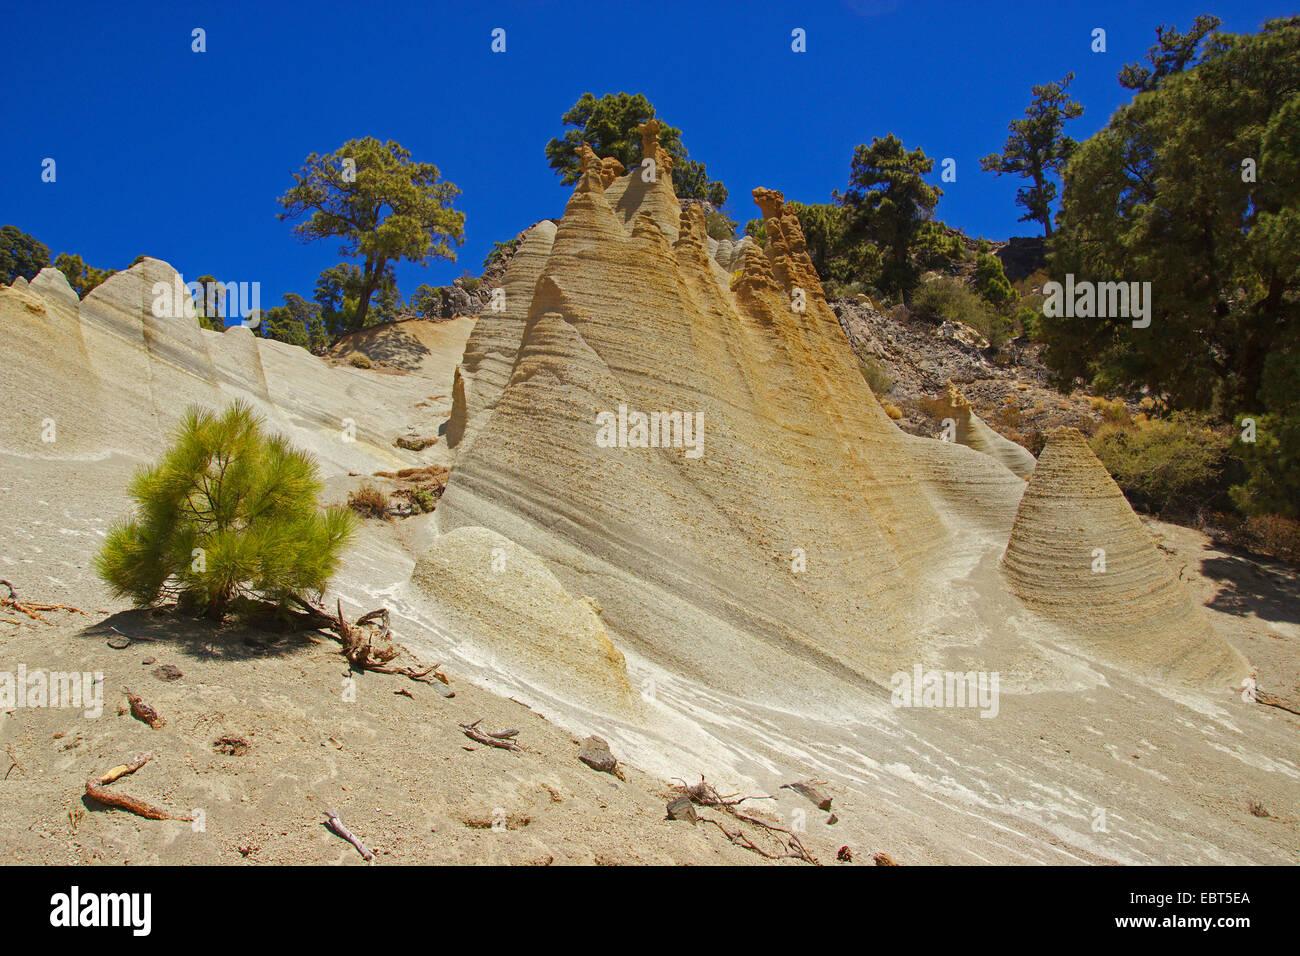 Paisaje Lunar rock formation, Canary Islands, Tenerife, Vilaflor - Stock Image